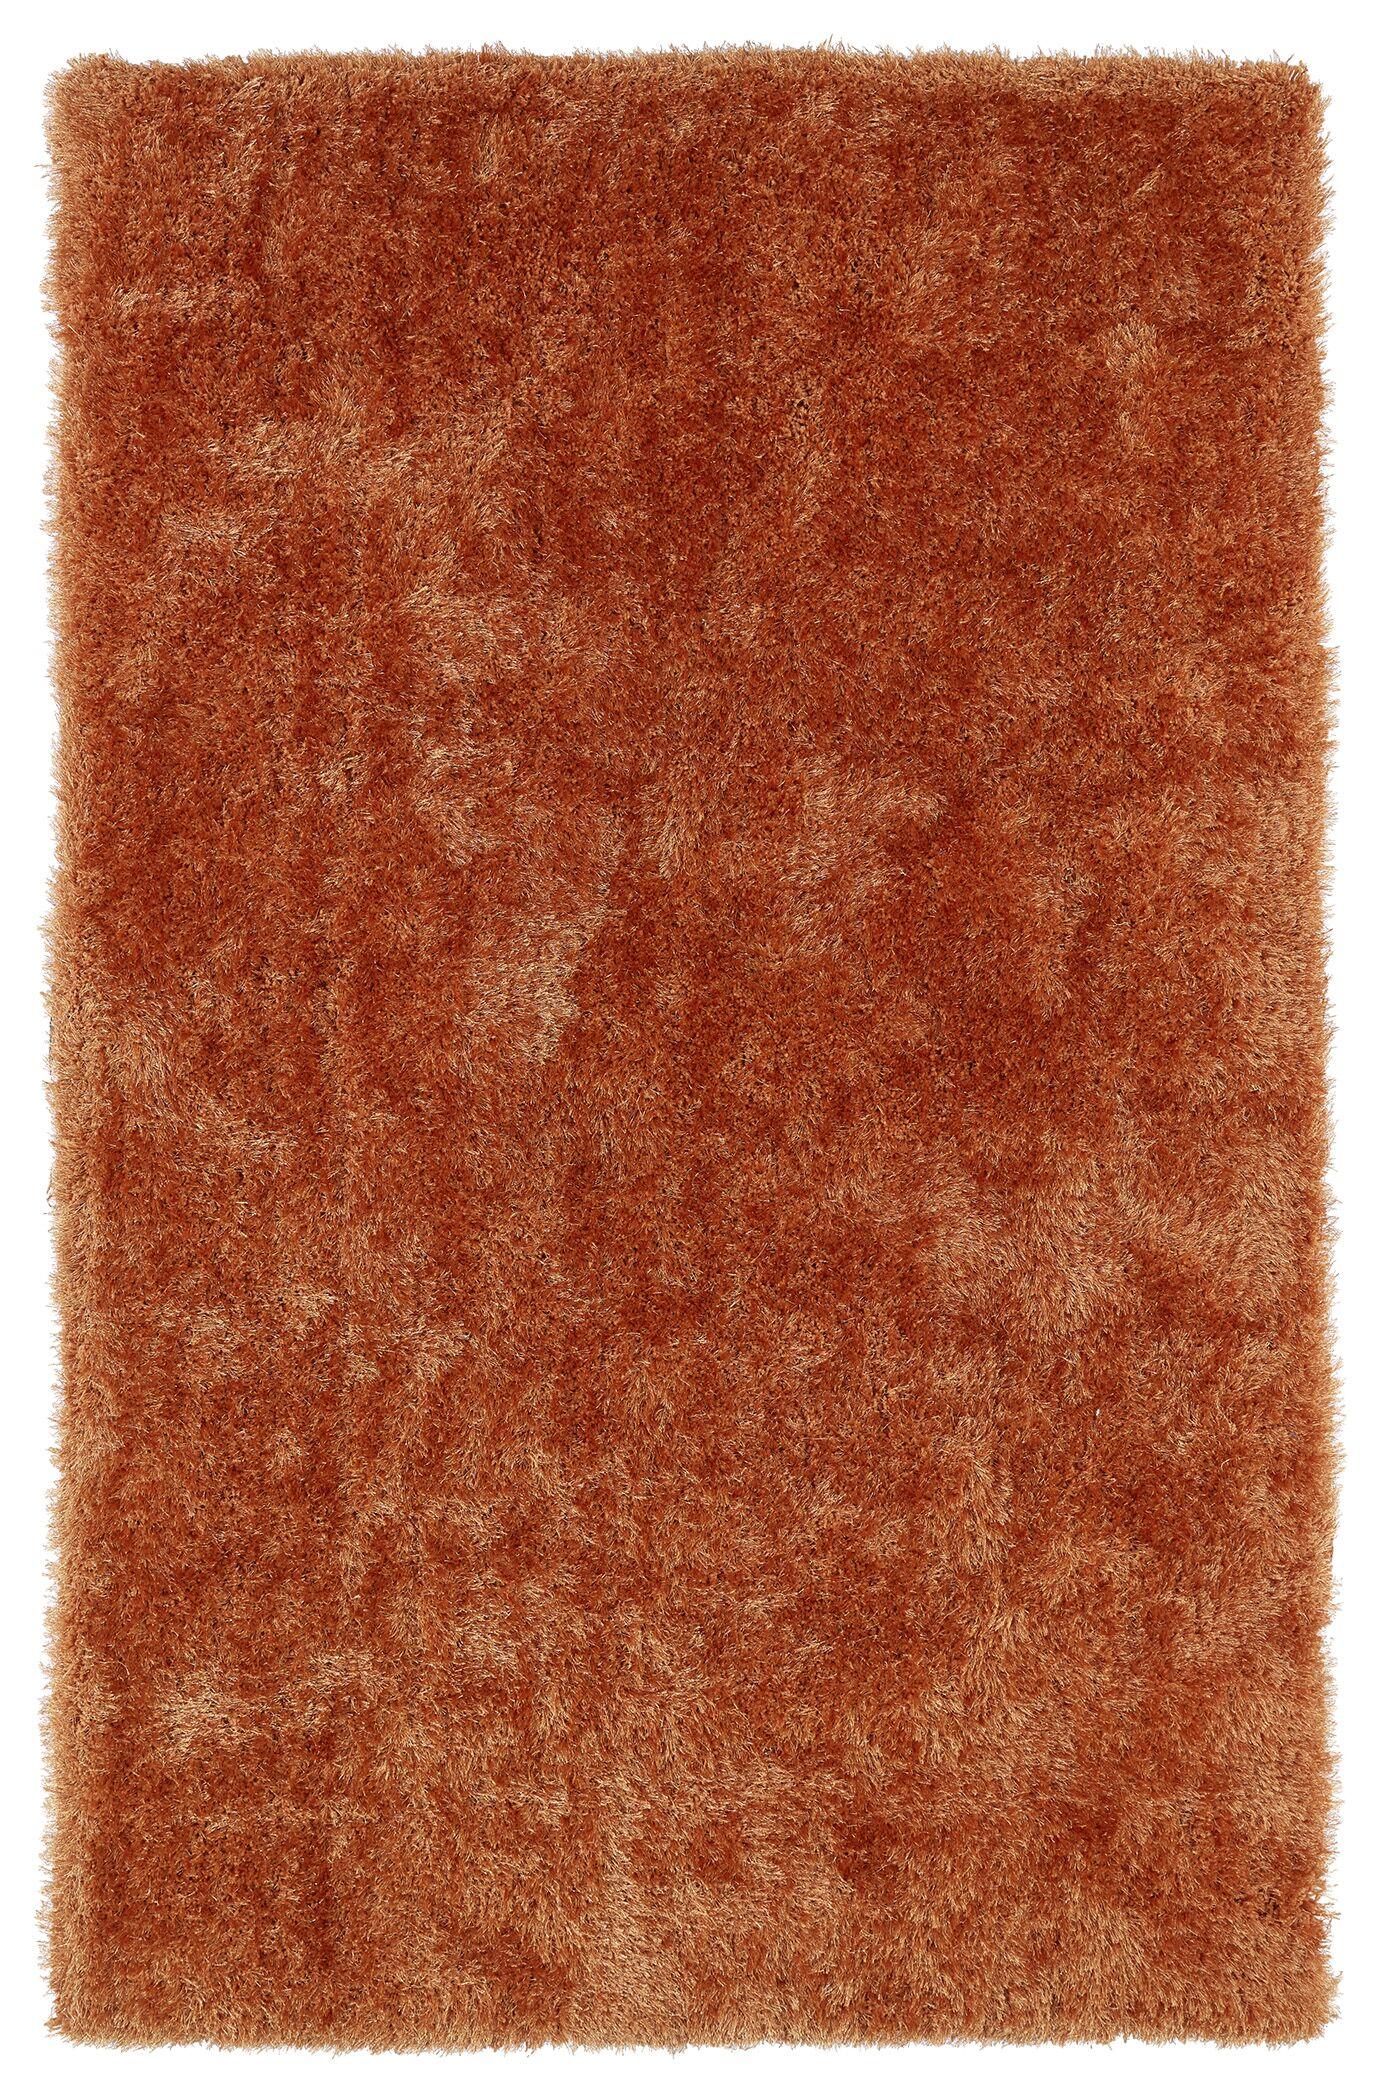 Caine Orange Area Rug Rug Size: Rectangle 8' x 10'